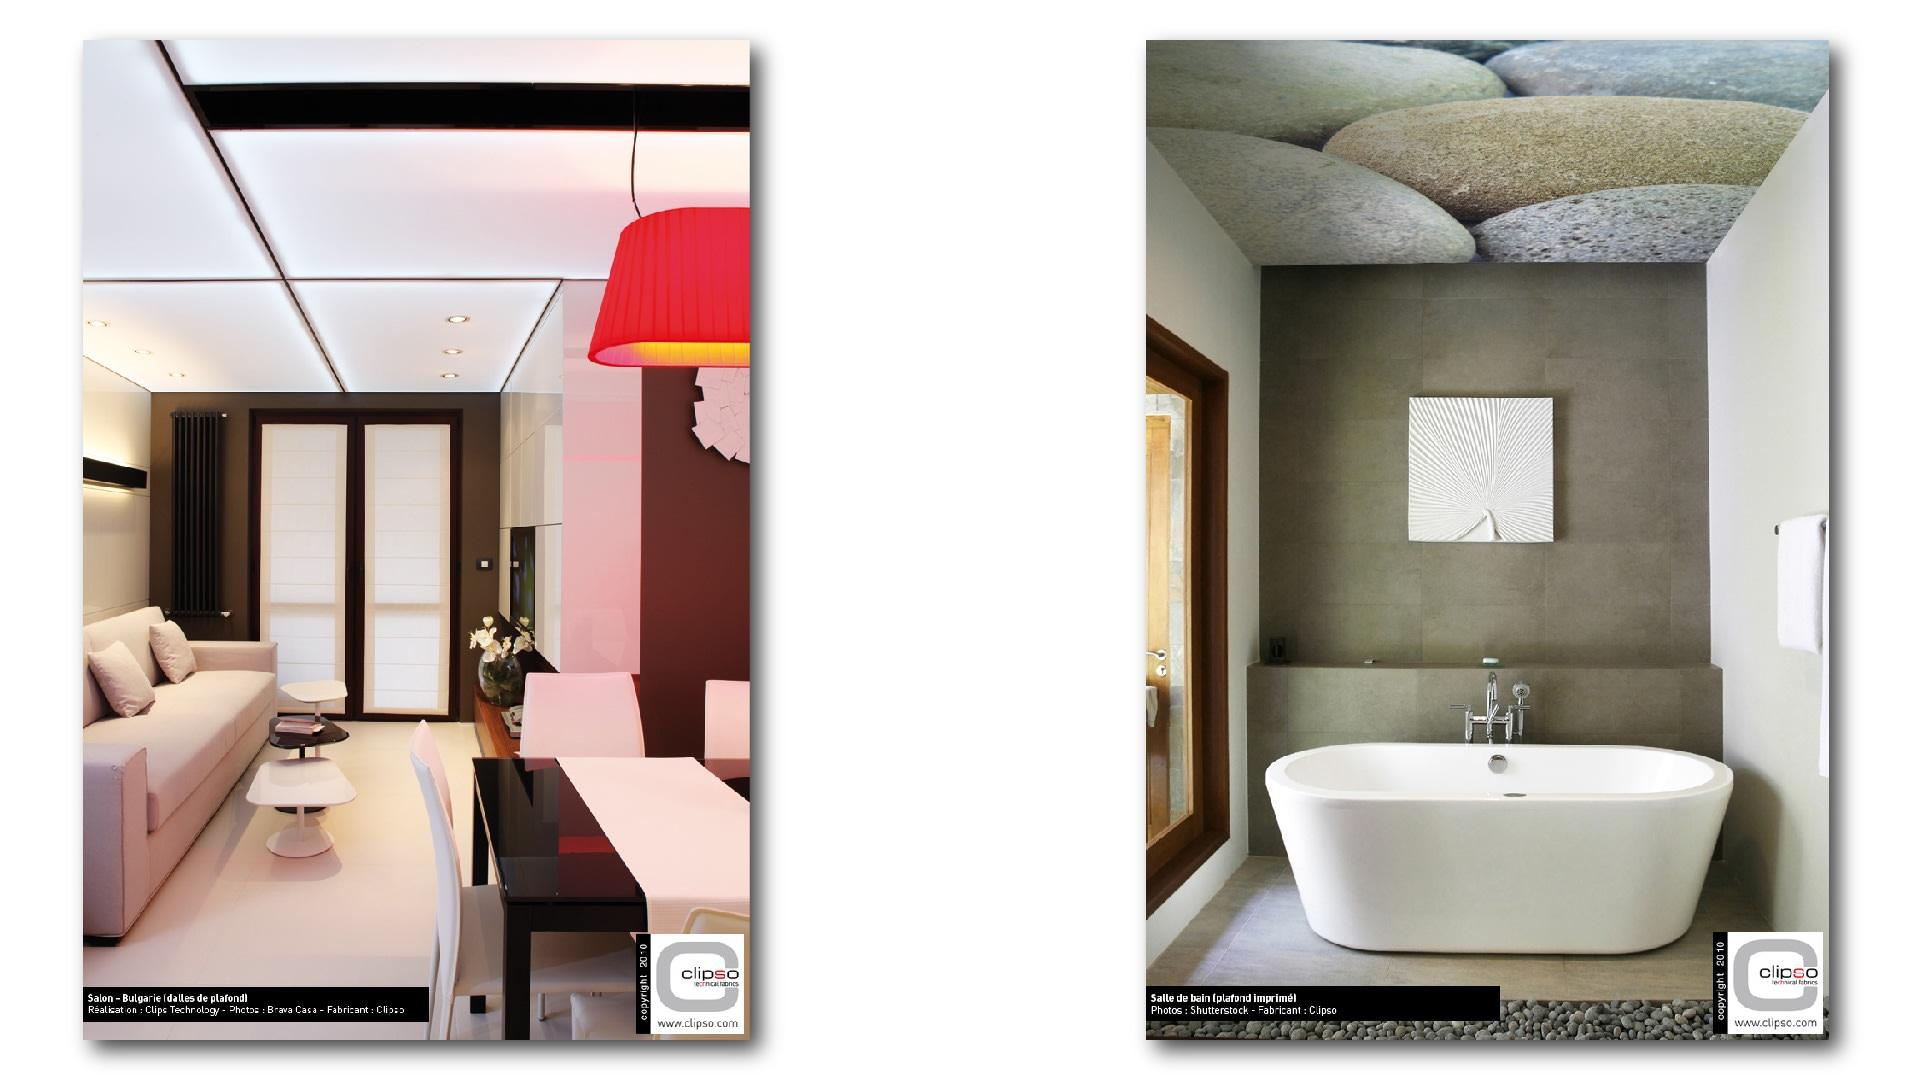 Clipso-Transluzent-Wohnzimmer_Clipso-Print-Badezimmer-01_myvyjk